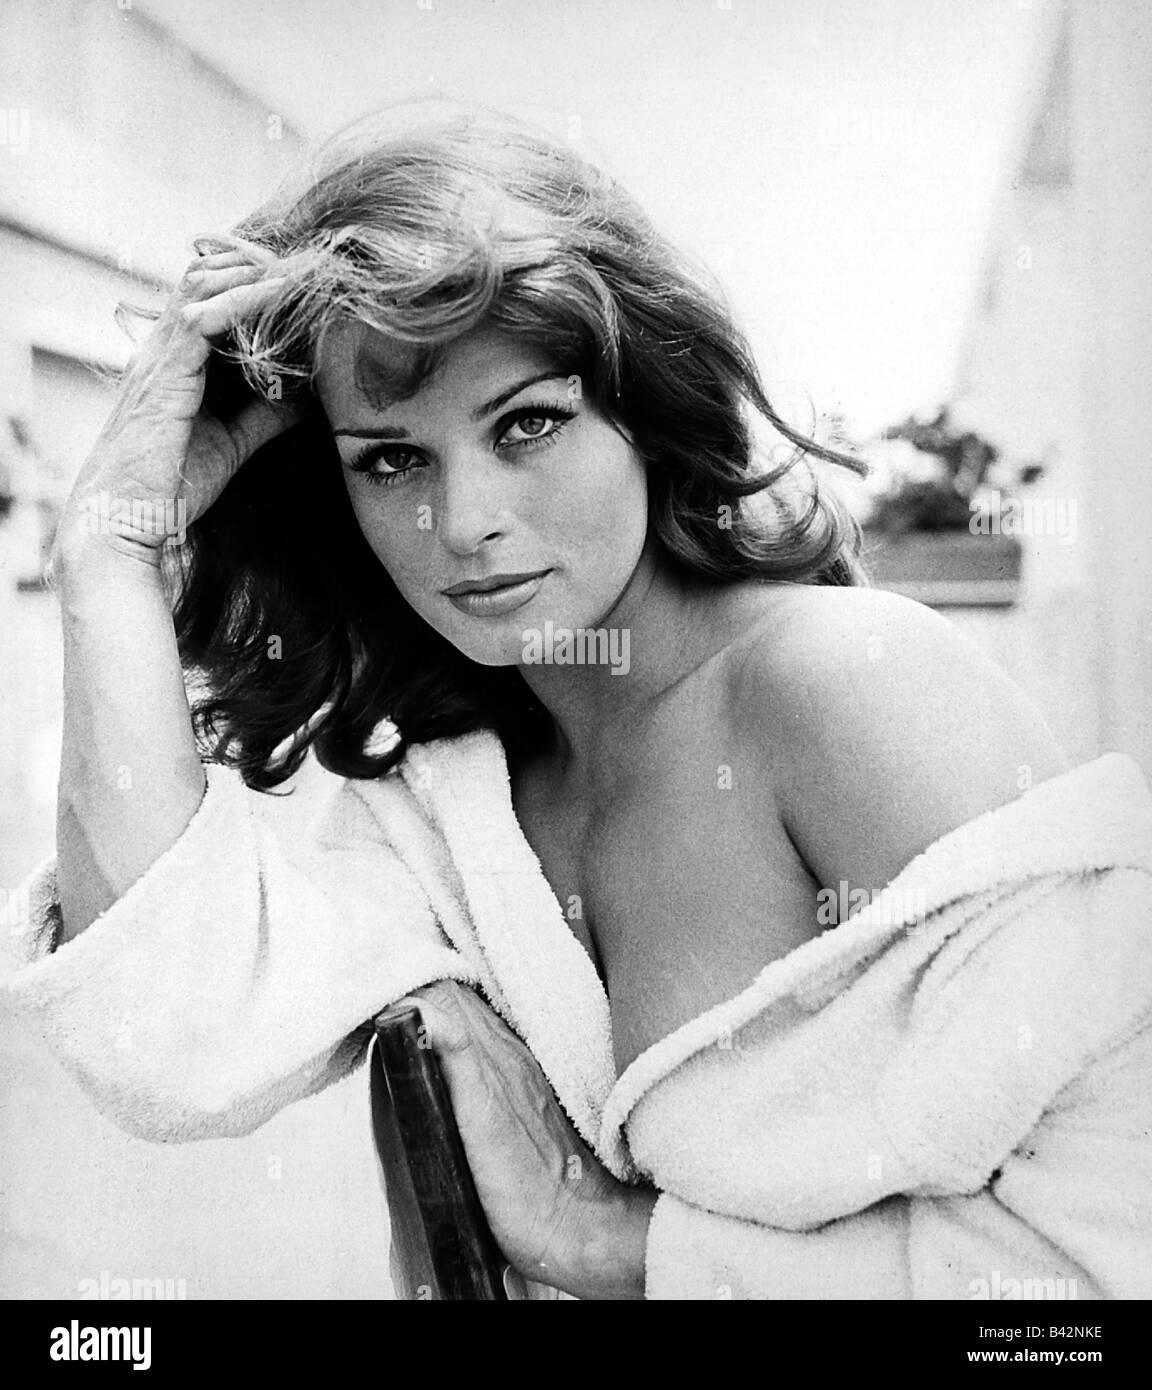 Berger, Senta, * 13.5.1941, Austrian actress, portrait, 1960s, Stock Photo